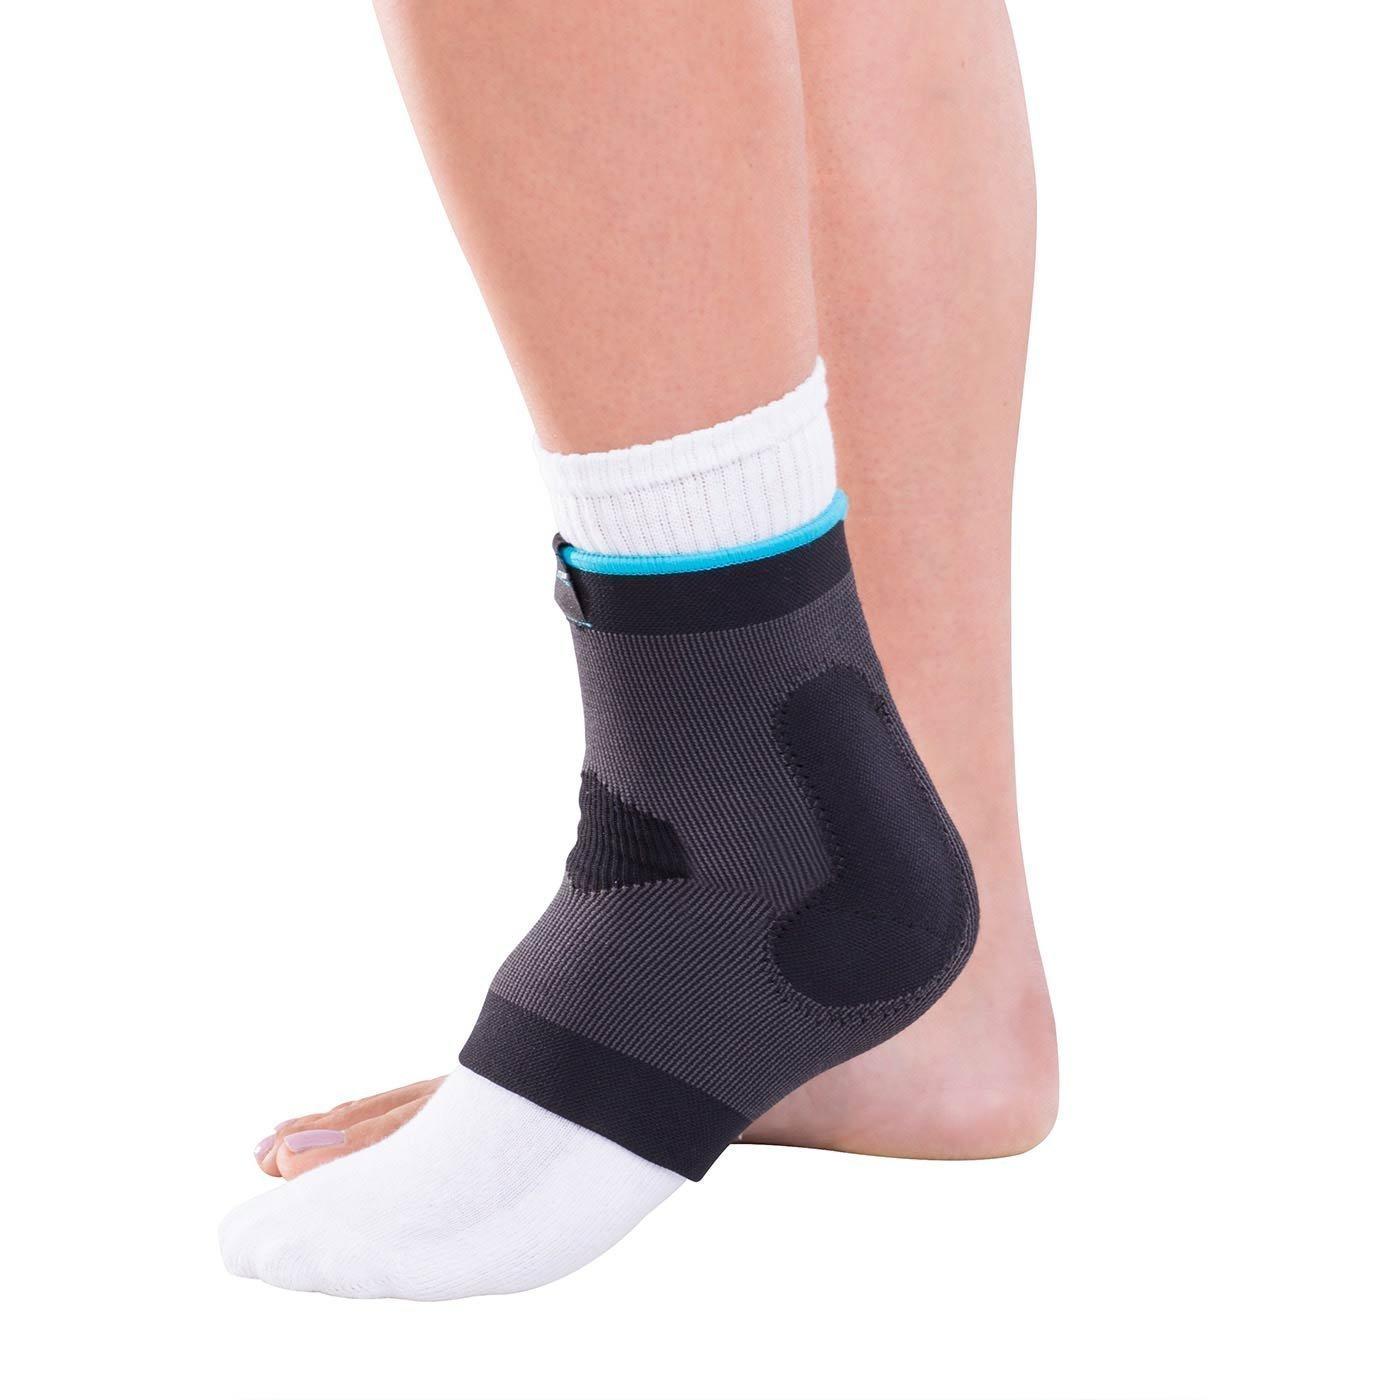 "DonJoy Advantage DA161AV02-BLK-S Deluxe Elastic Ankle for Sprains, Strains, Swelling, Black, Small fits 7.75"", 8.5"""